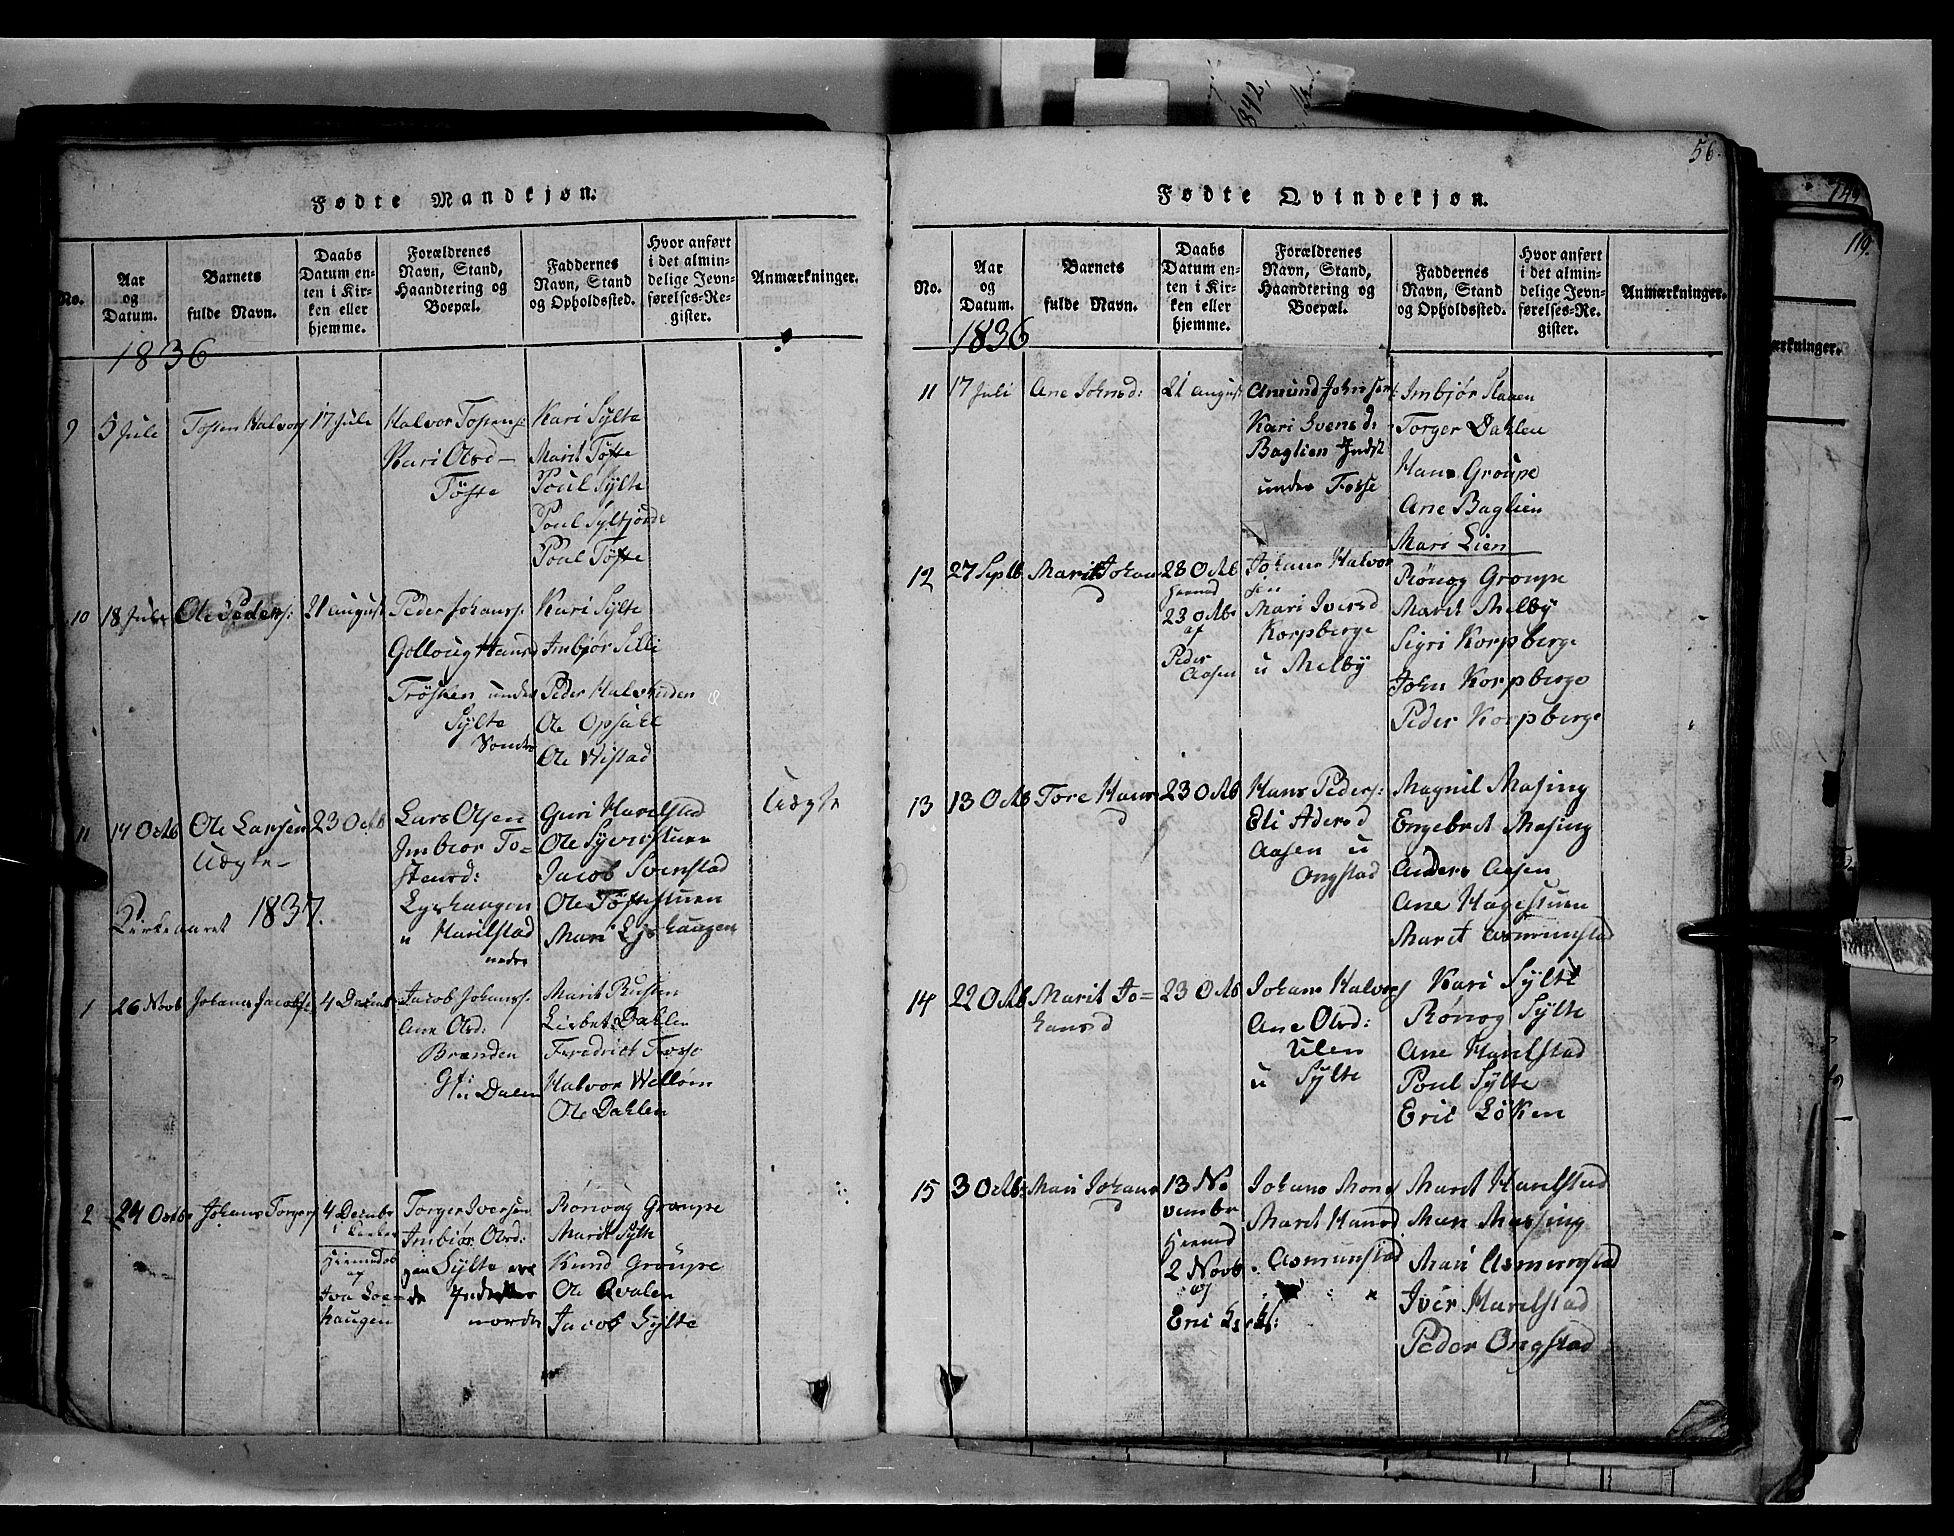 SAH, Fron prestekontor, H/Ha/Hab/L0003: Klokkerbok nr. 3, 1816-1850, s. 56